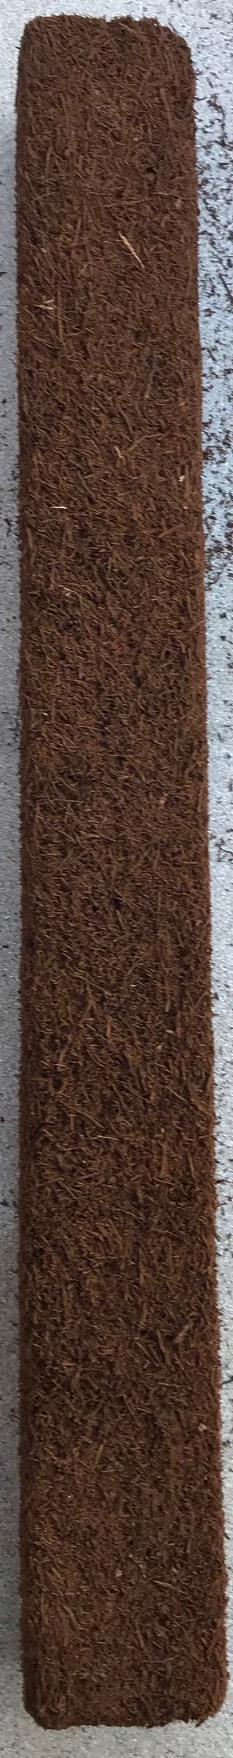 Fernwood Tree Fern Totem 50 x 5 x 5 cm